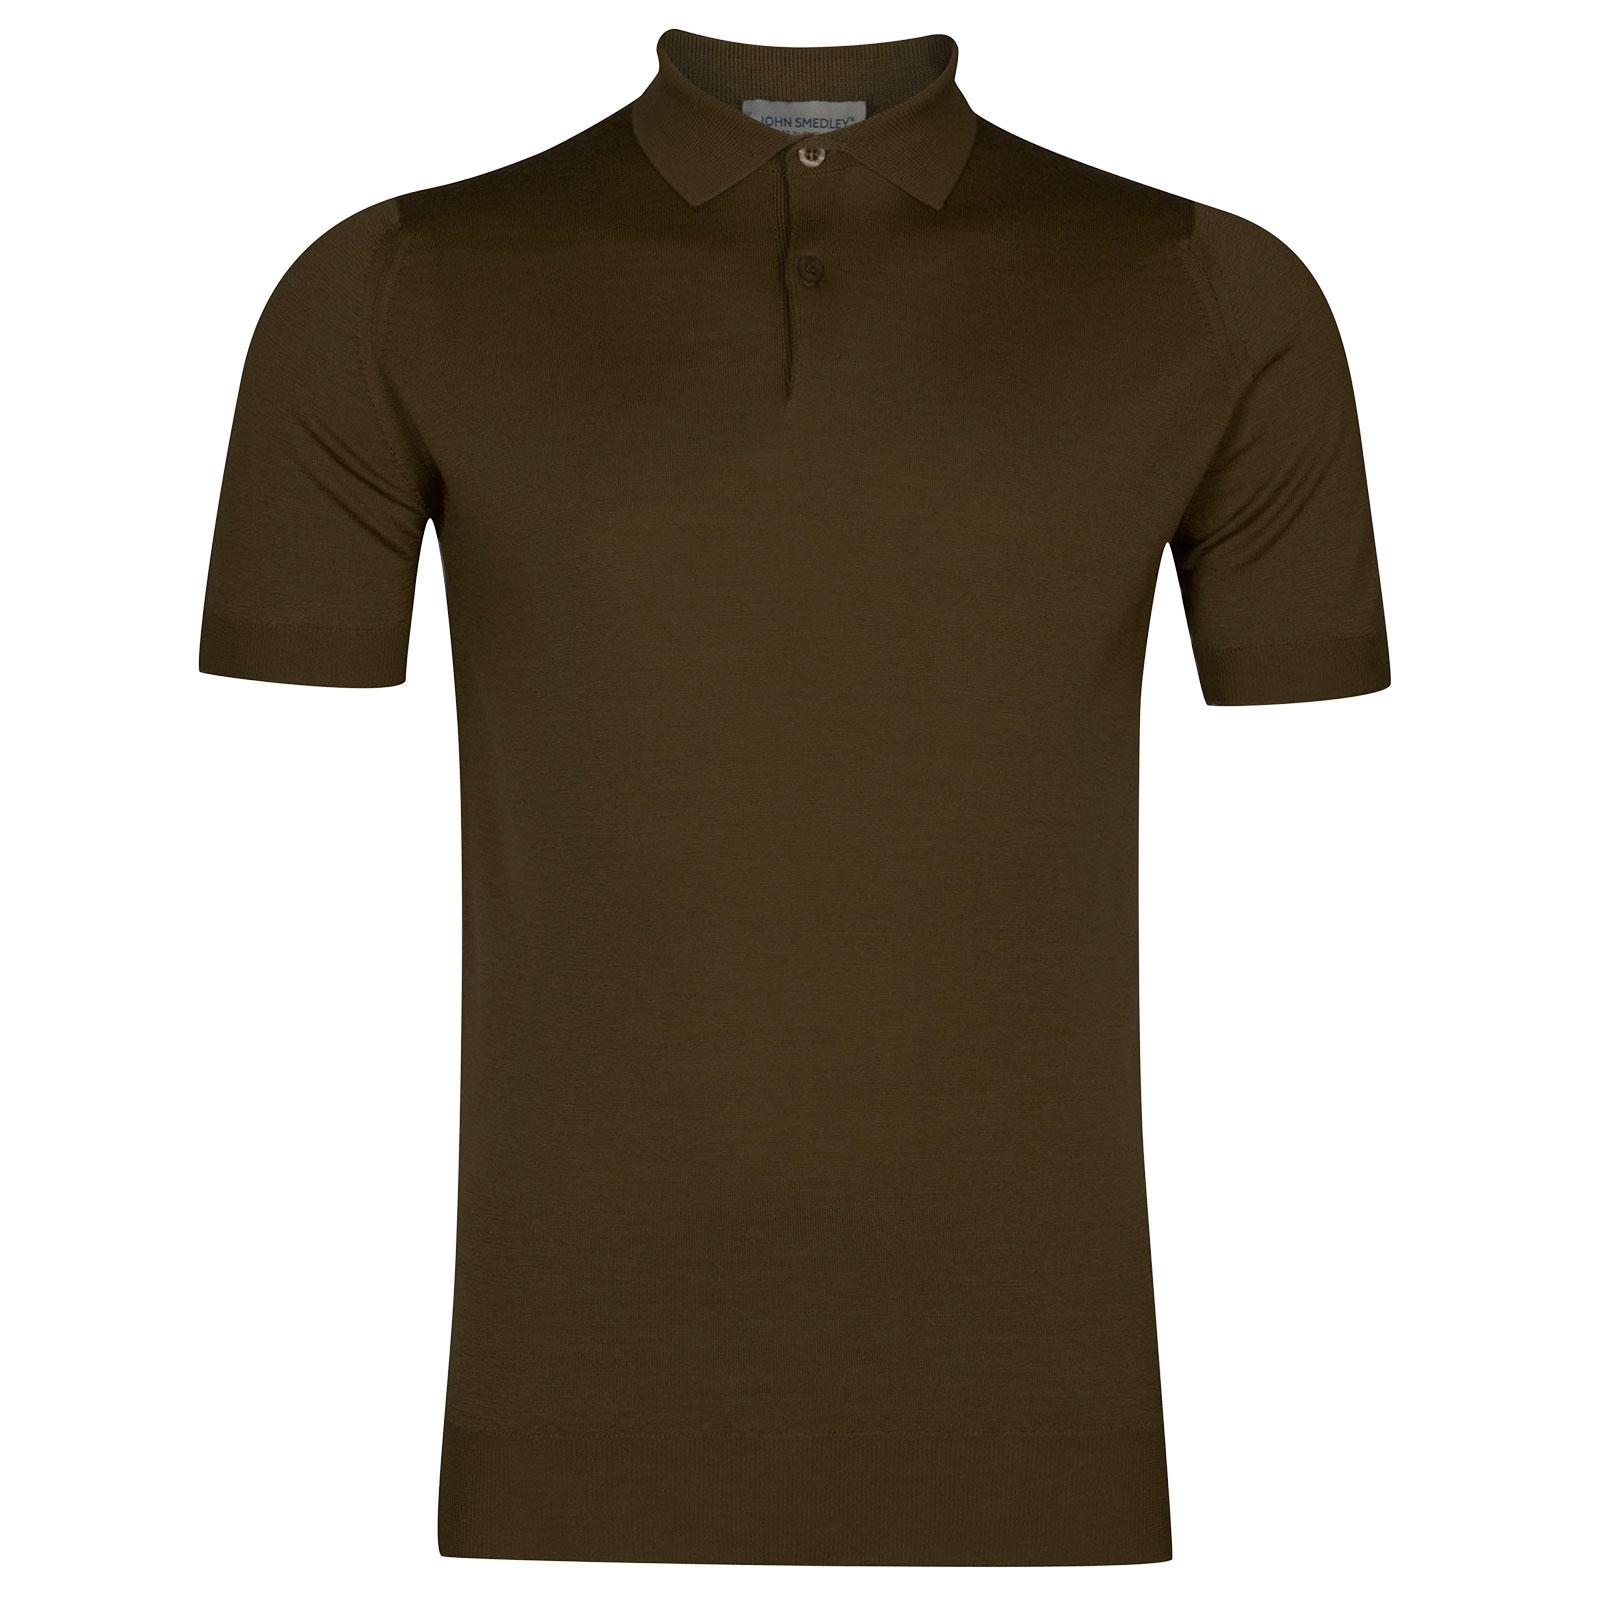 John Smedley Payton Merino Wool Shirt in Khaki-XXL